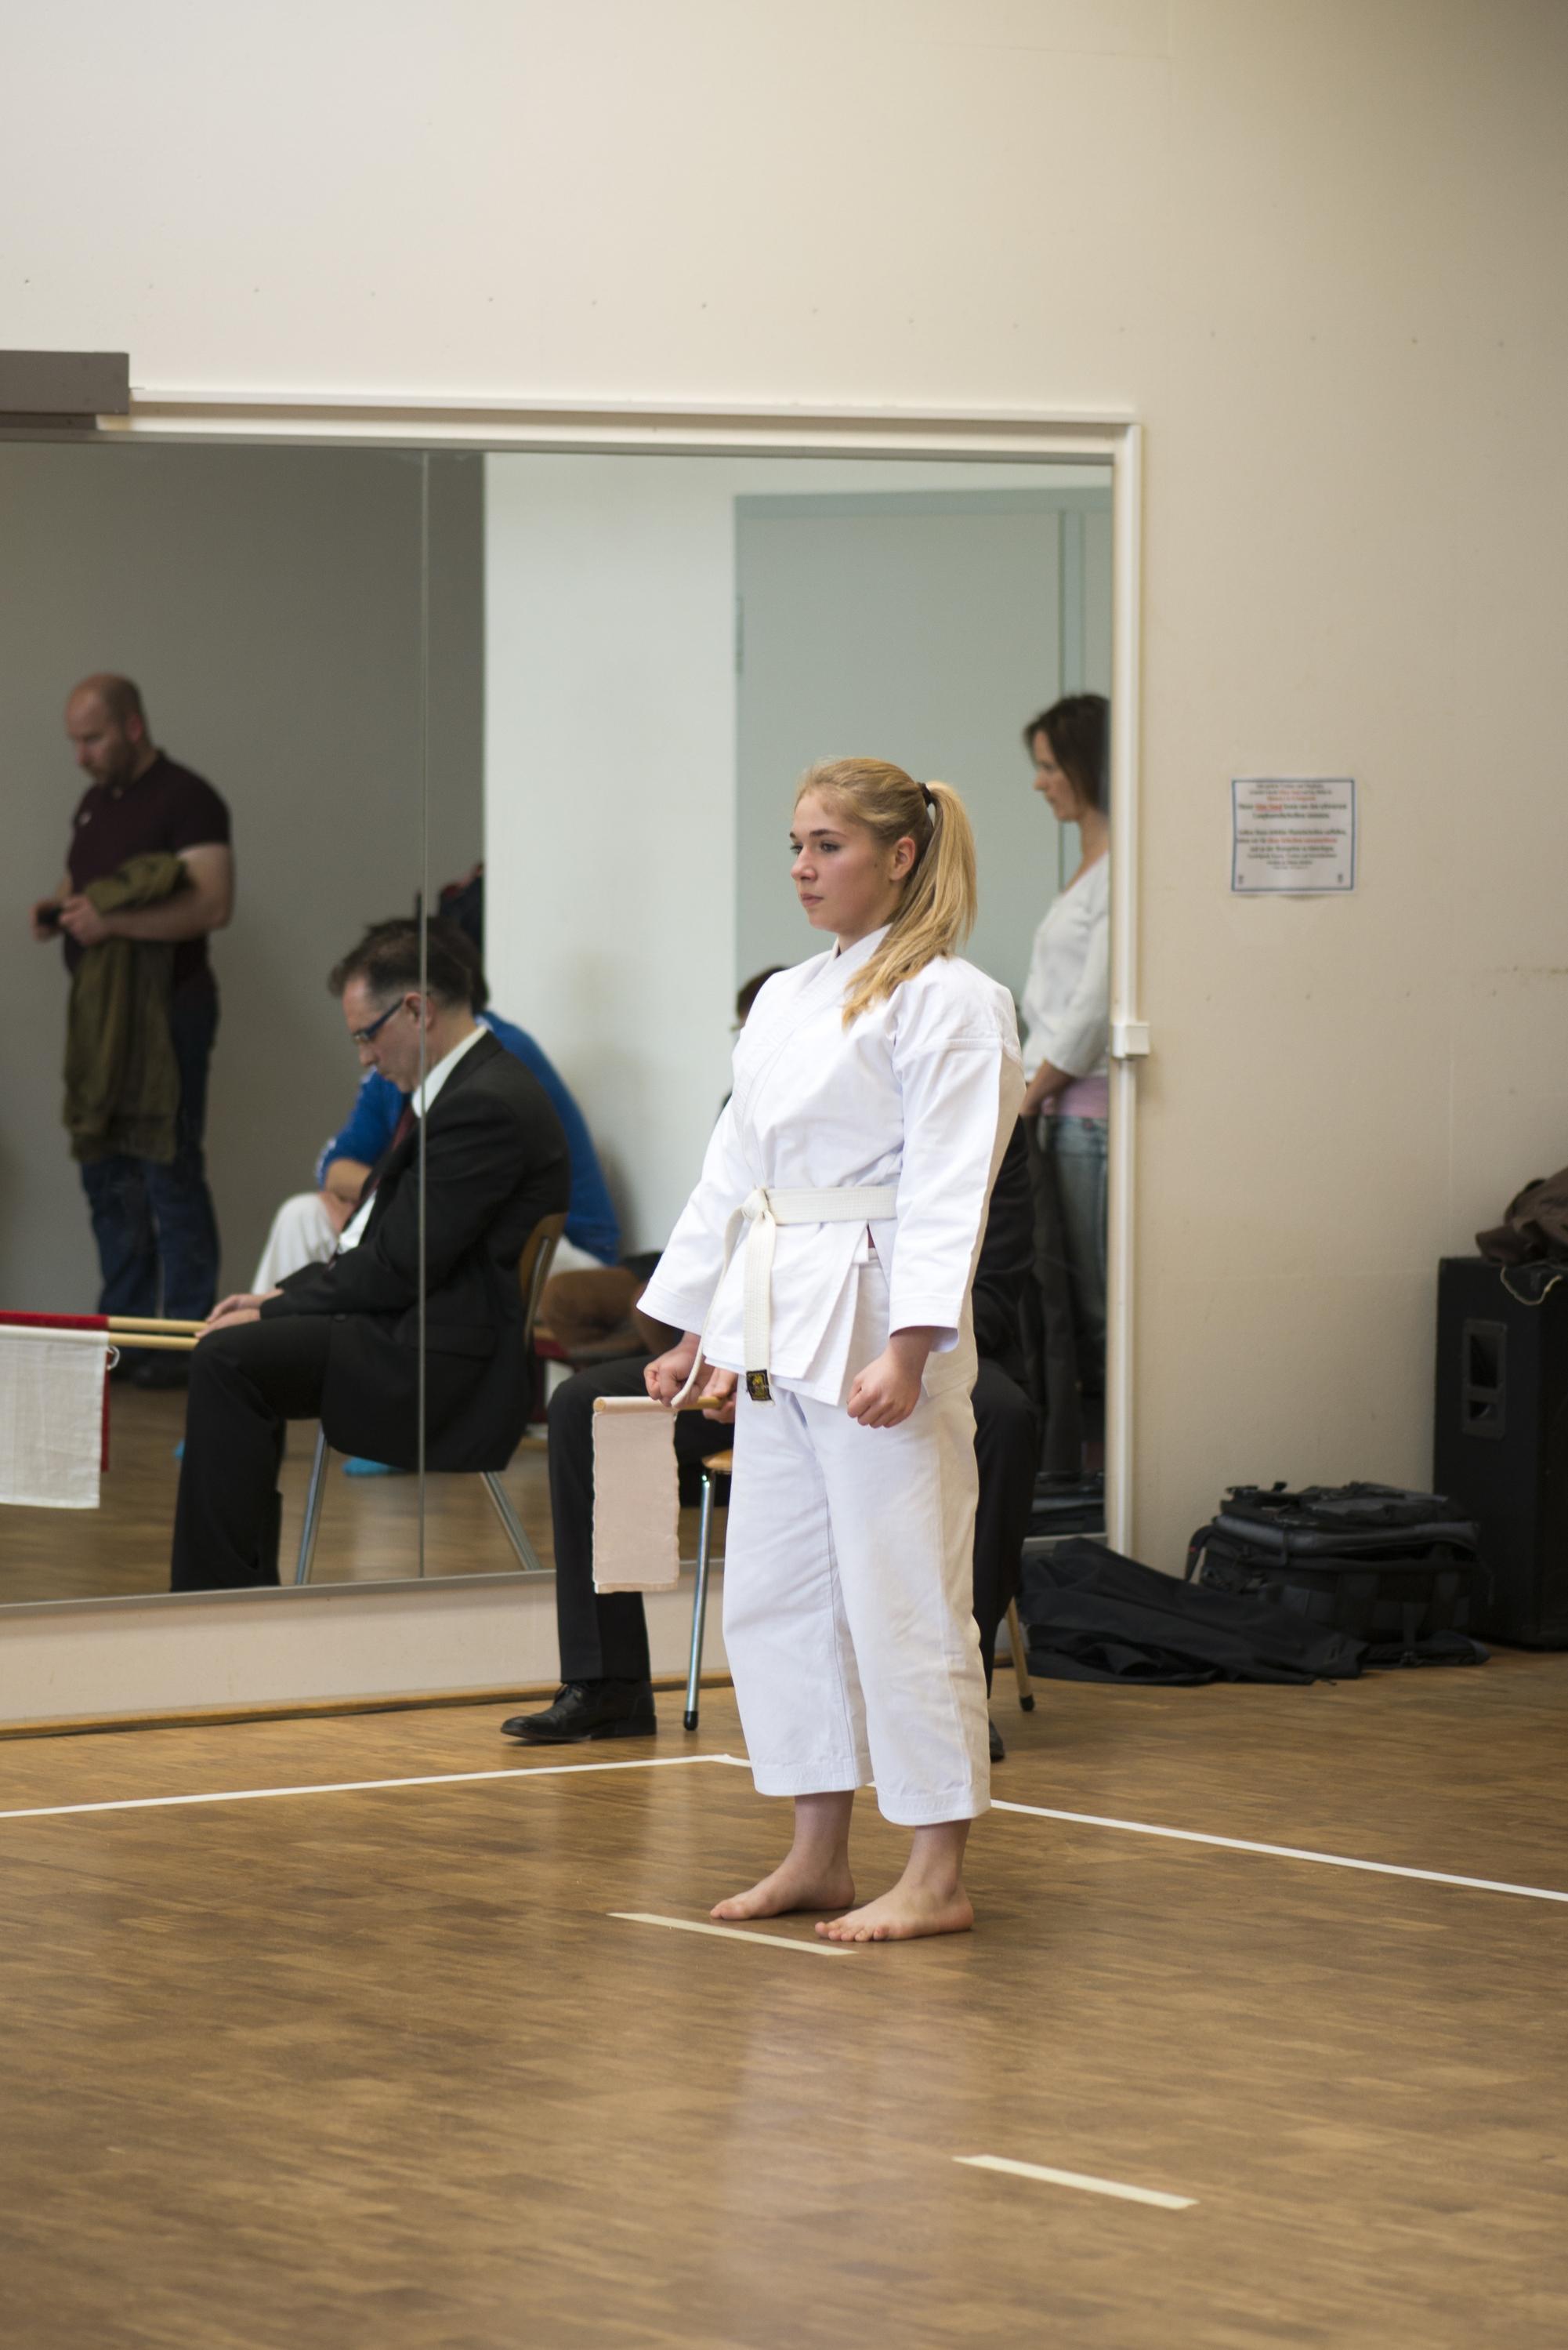 2016-04-26 Kata Turnier Kaarst 138